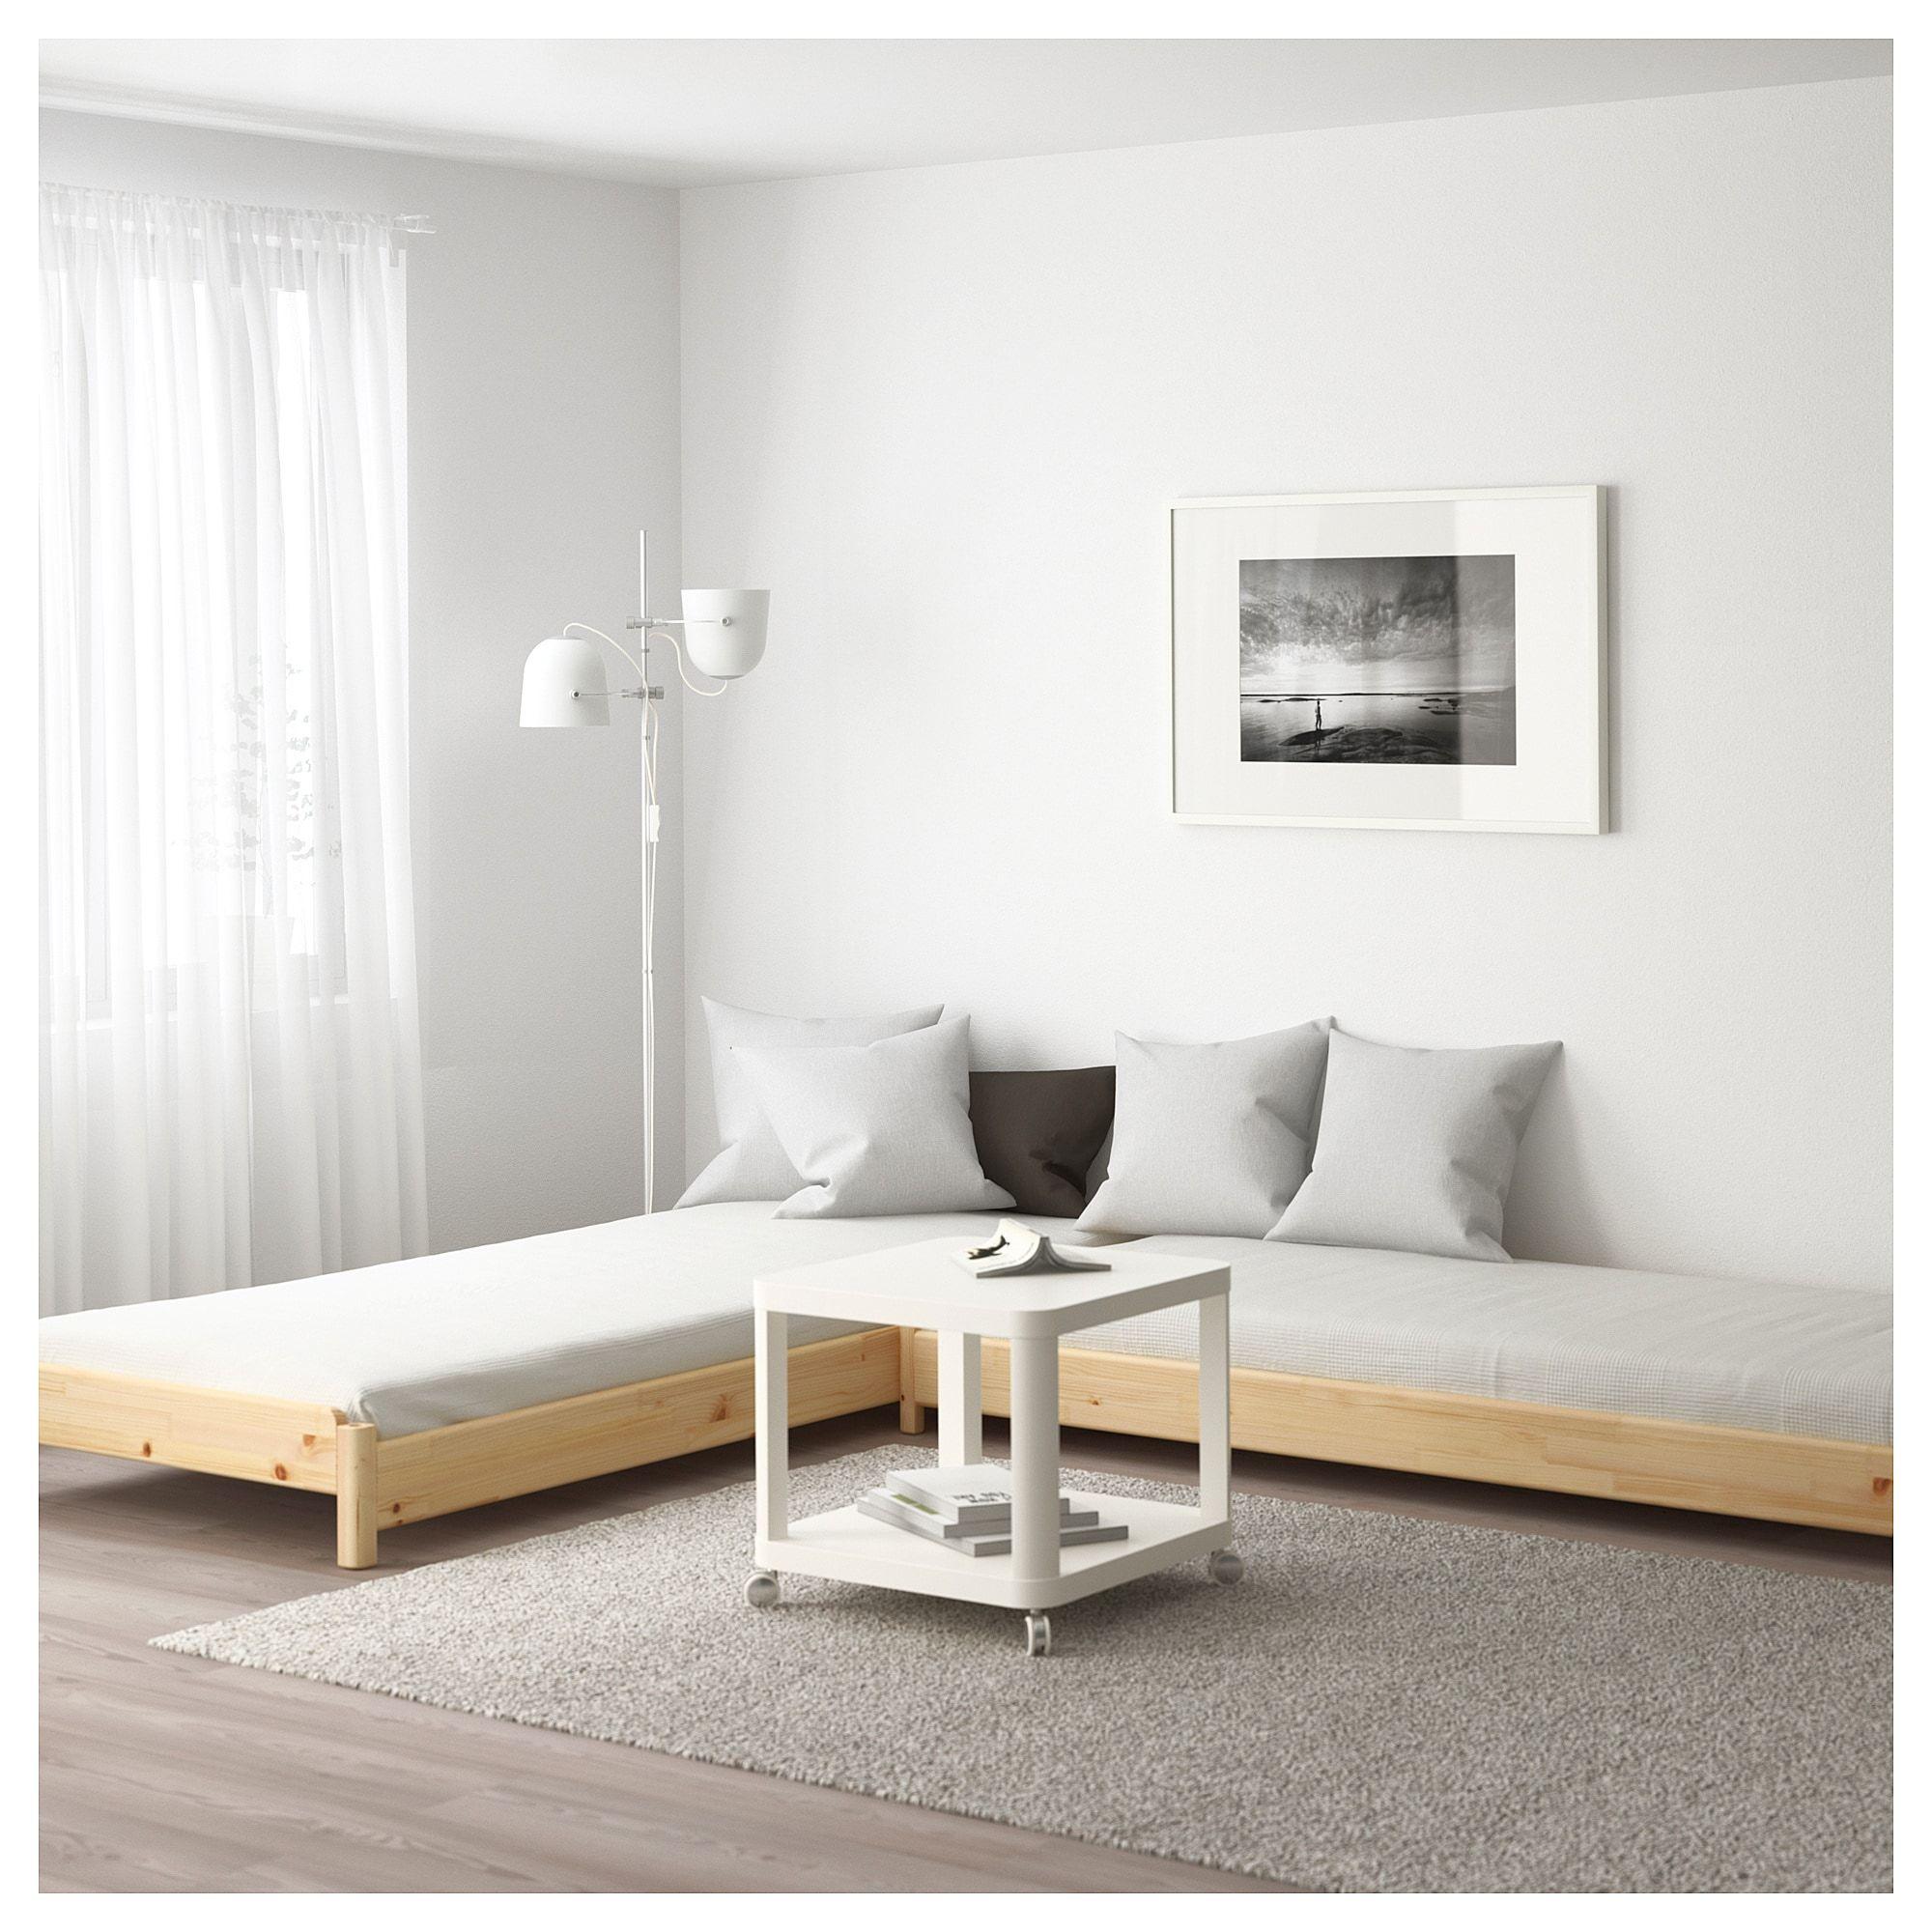 IKEA UTÅKER Stackable bed with 2 mattresses pine